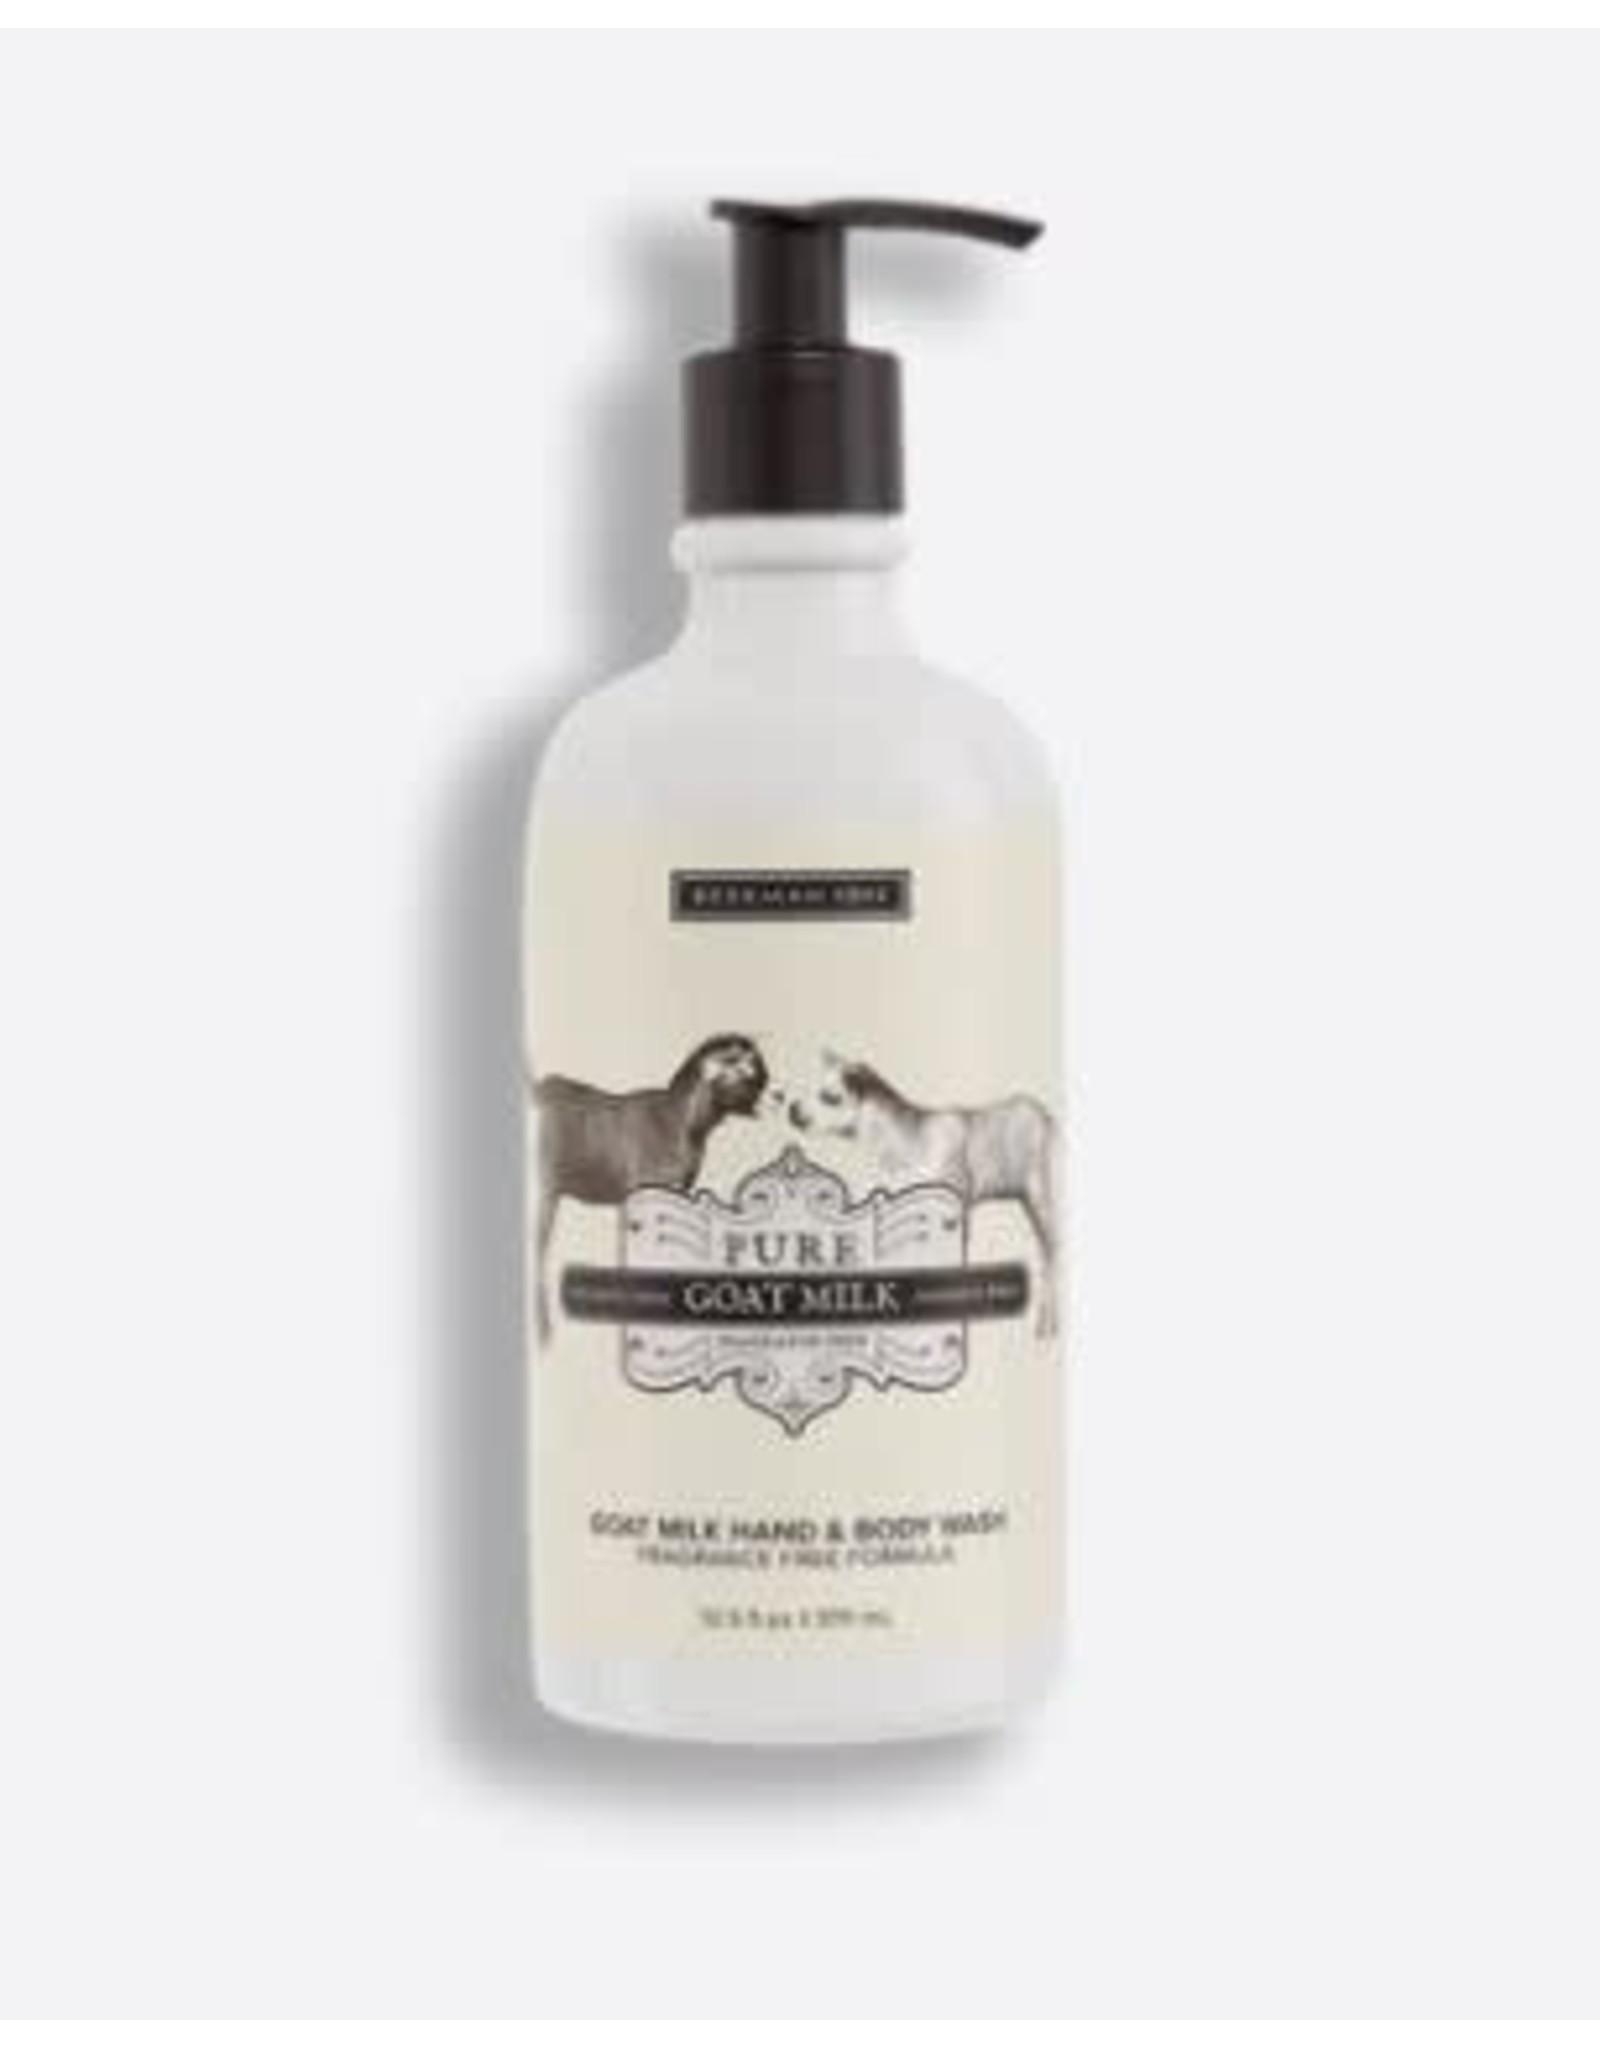 Beekman 1802, Inc 12.5oz Goat Milk Hand Wash